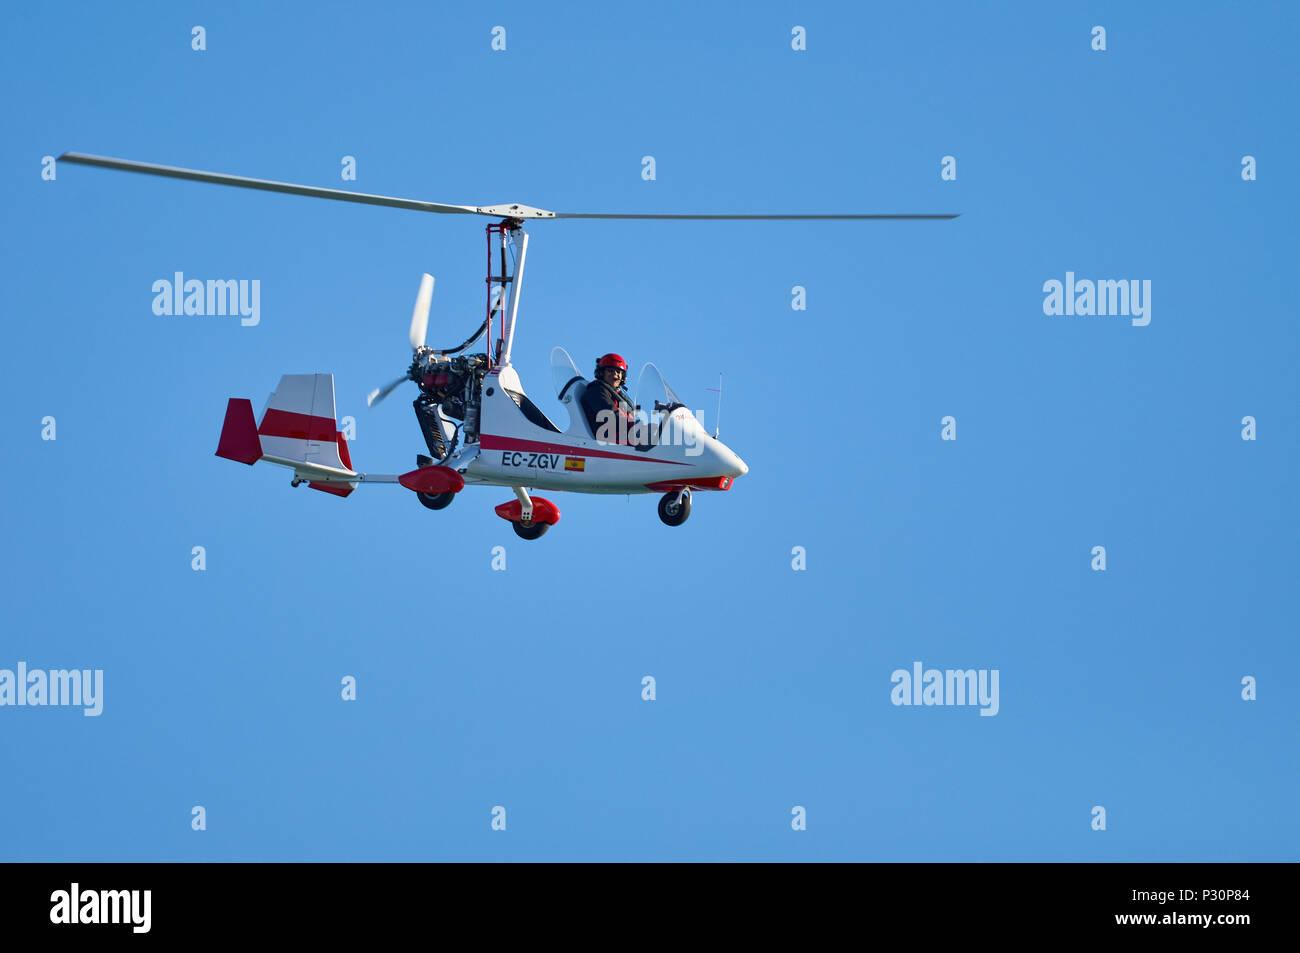 Autogyro Stock Photos & Autogyro Stock Images - Alamy